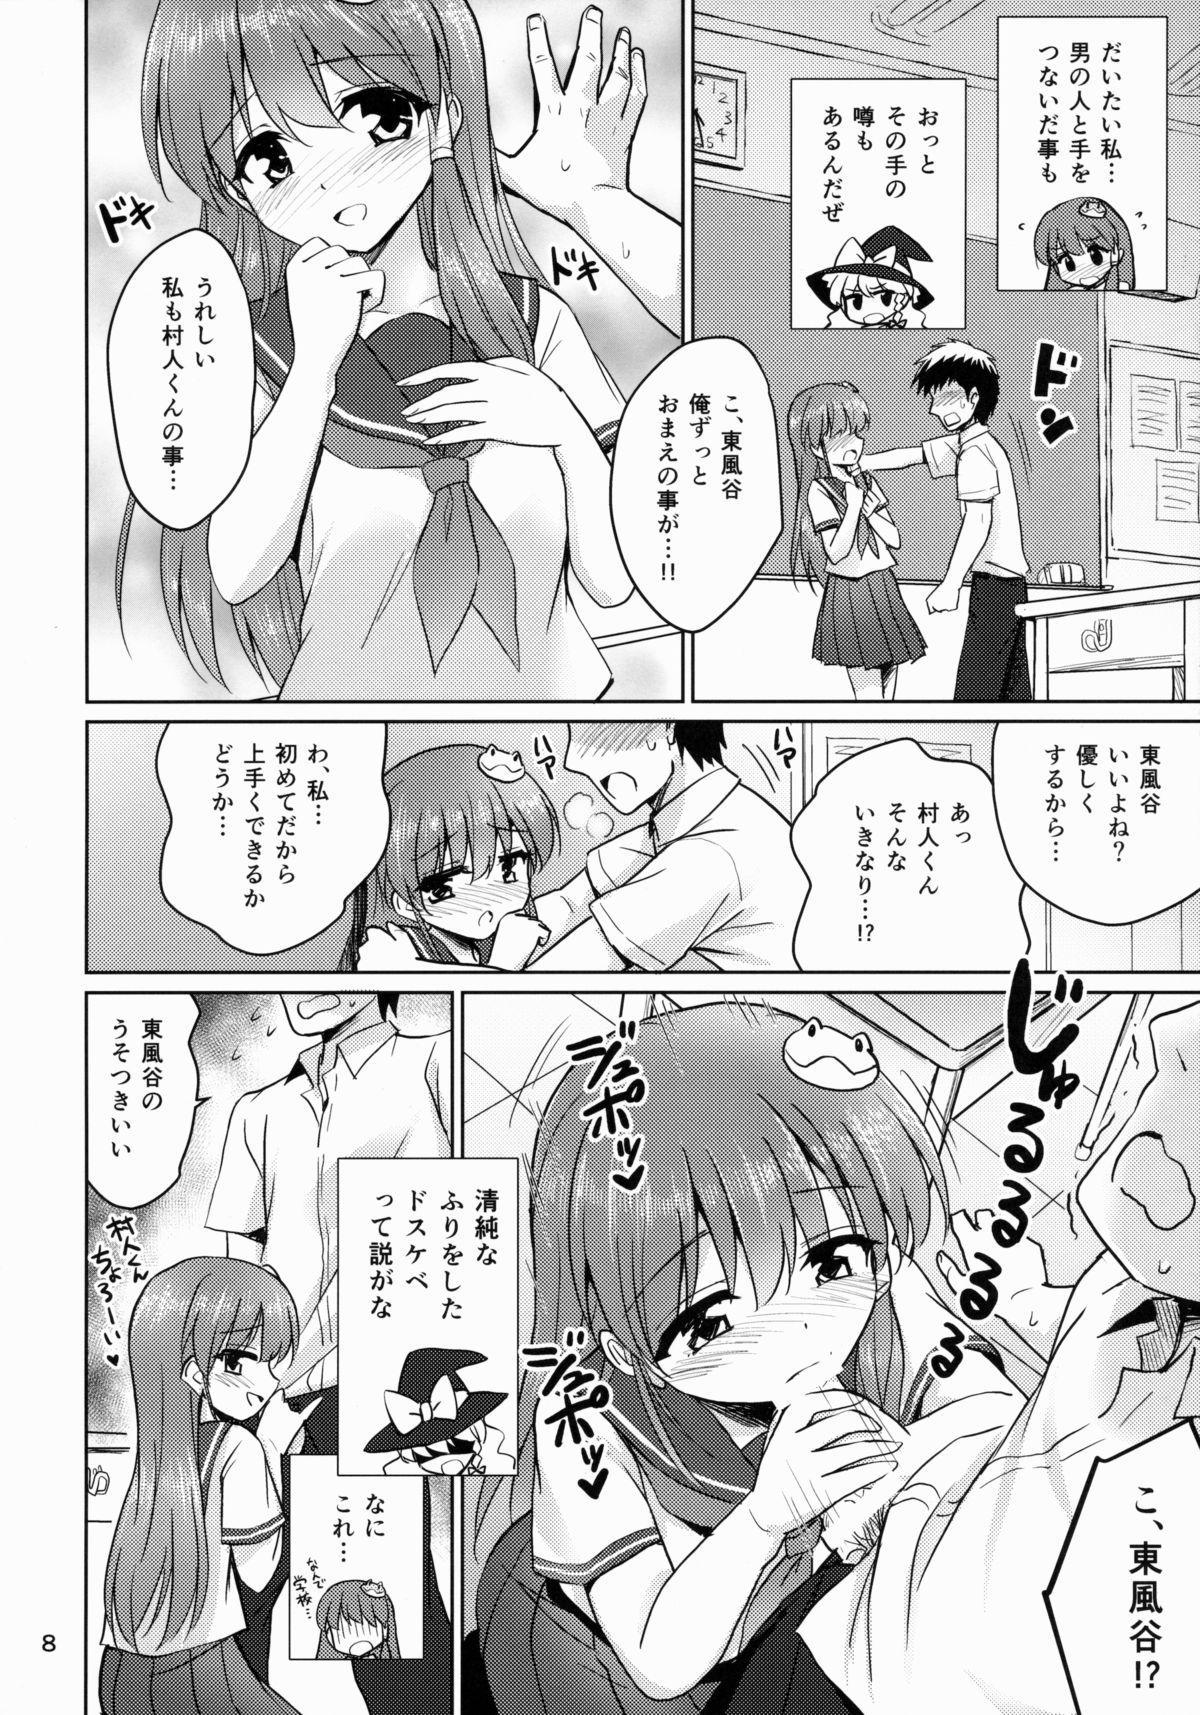 Ochinpo Daisuki Sana Bitch Shishou 6